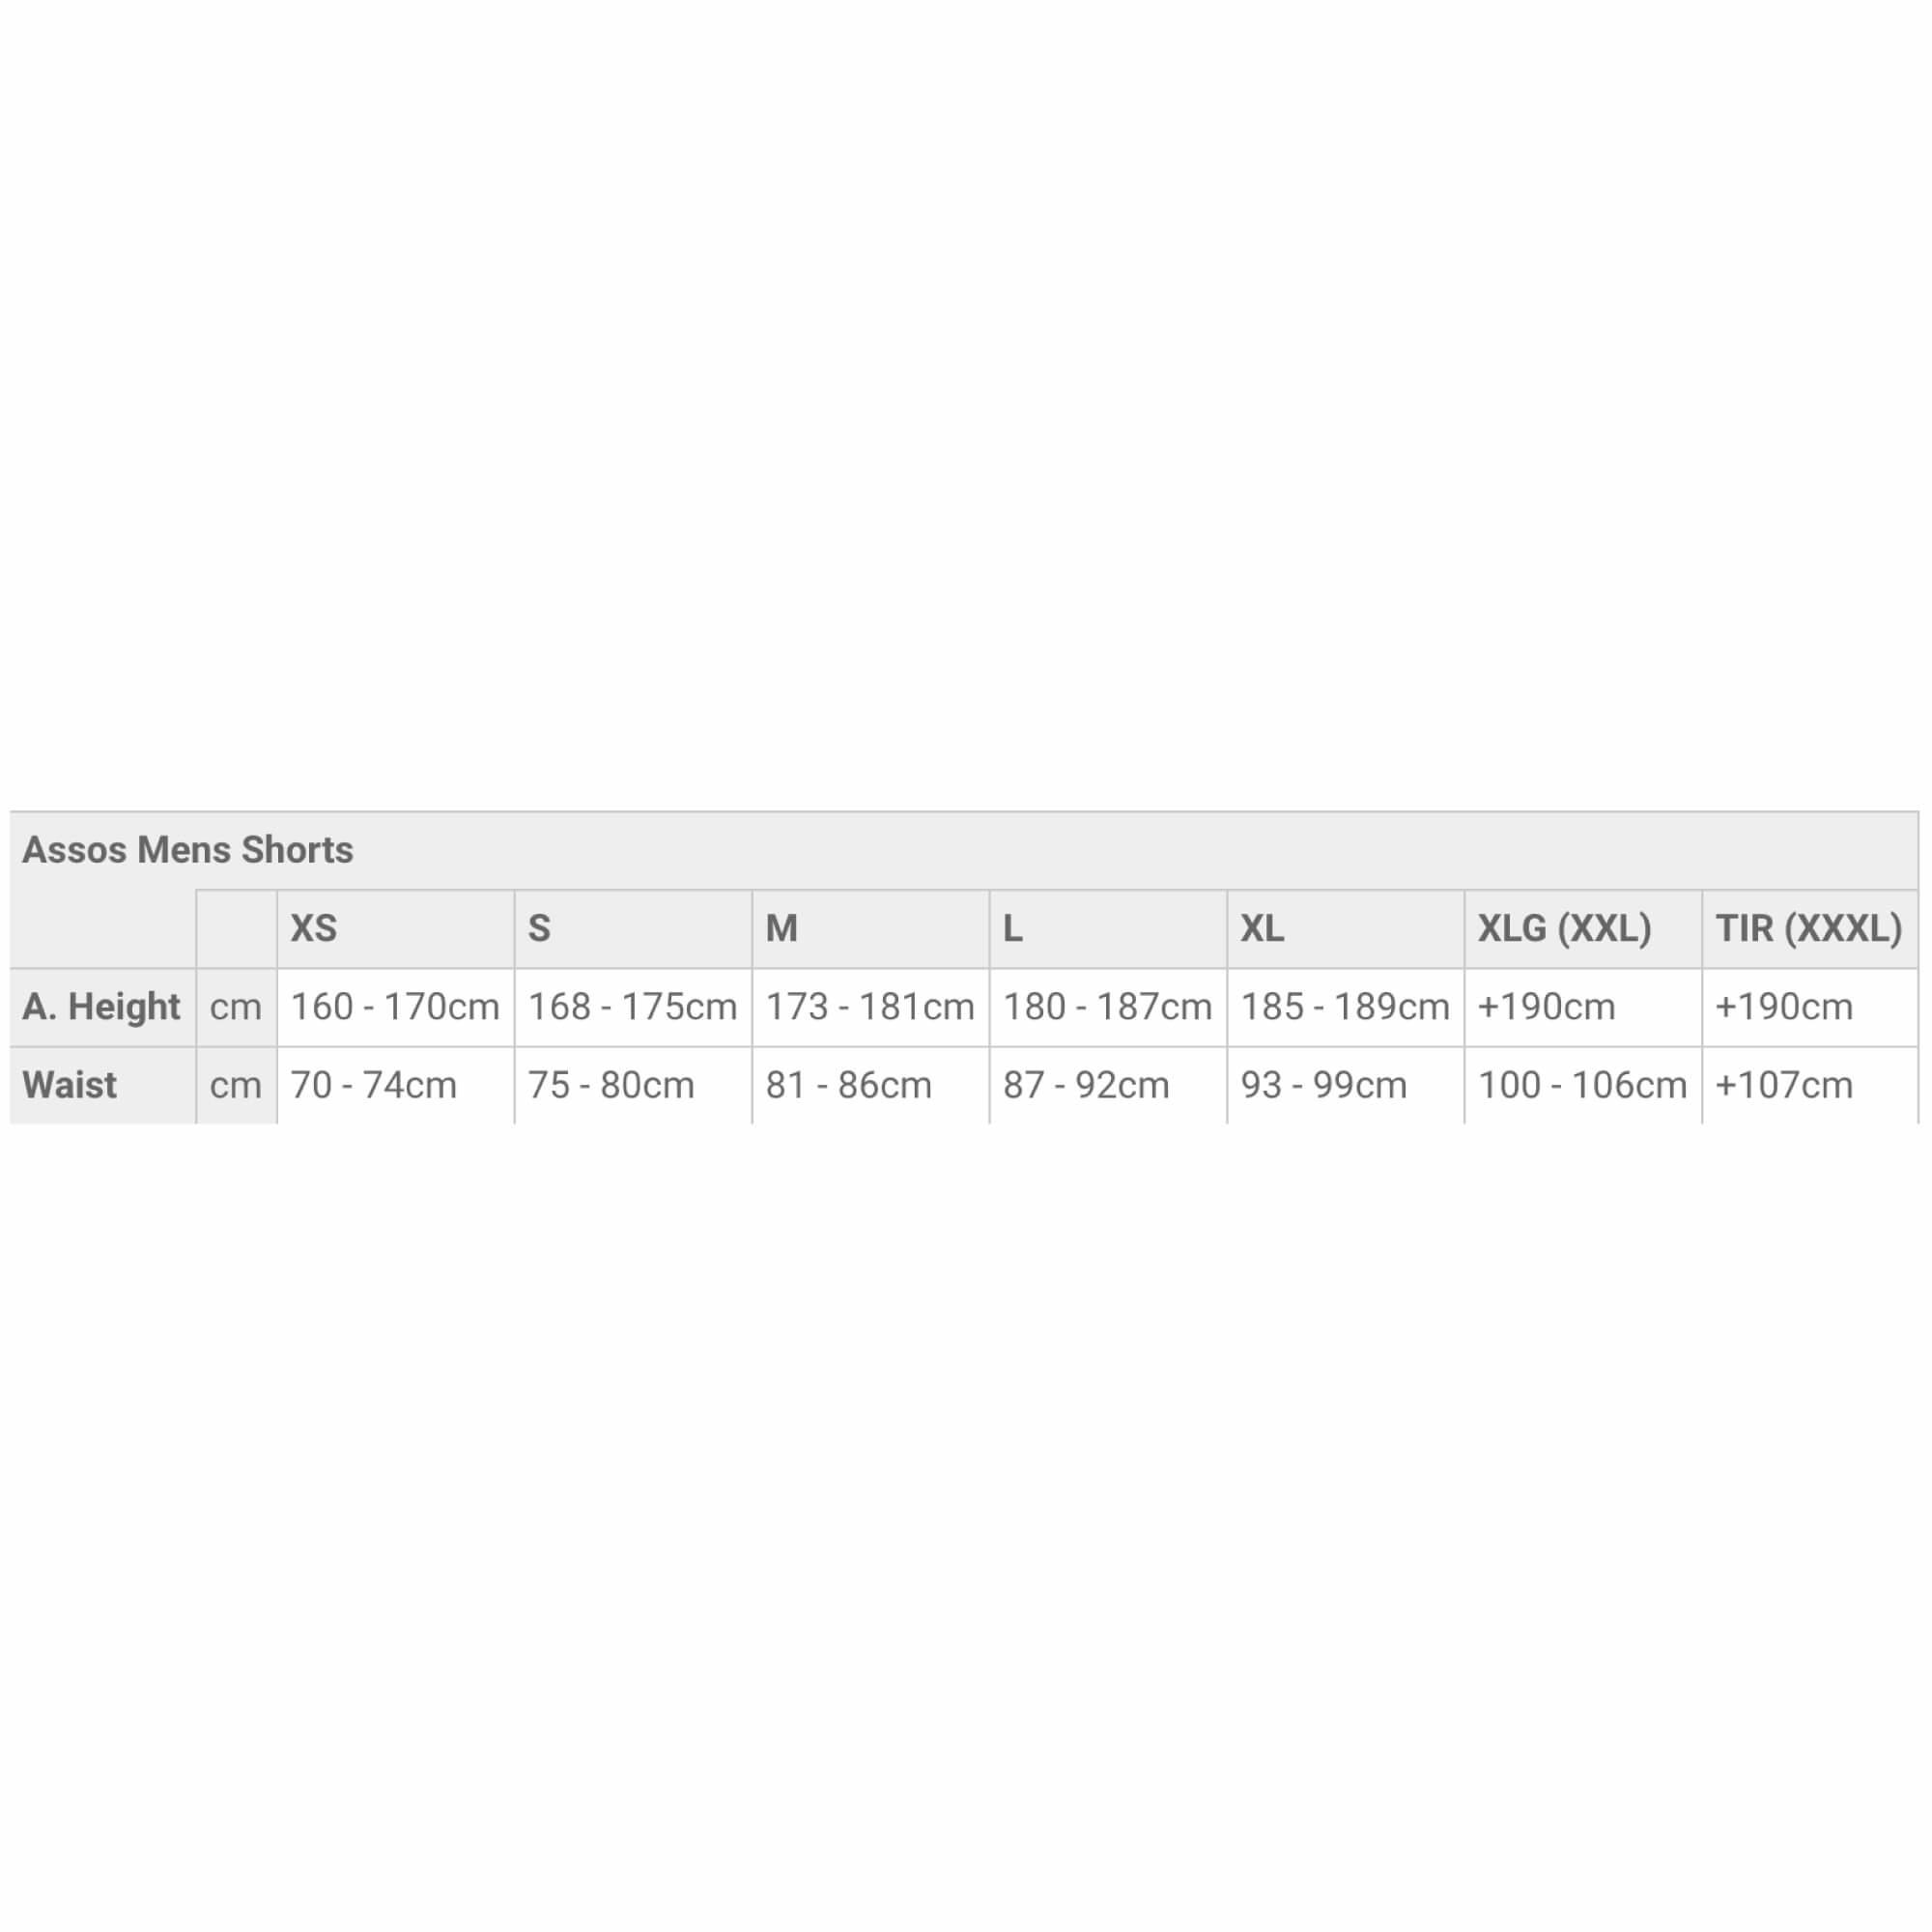 H.Mille S7 Bib Shorts-6